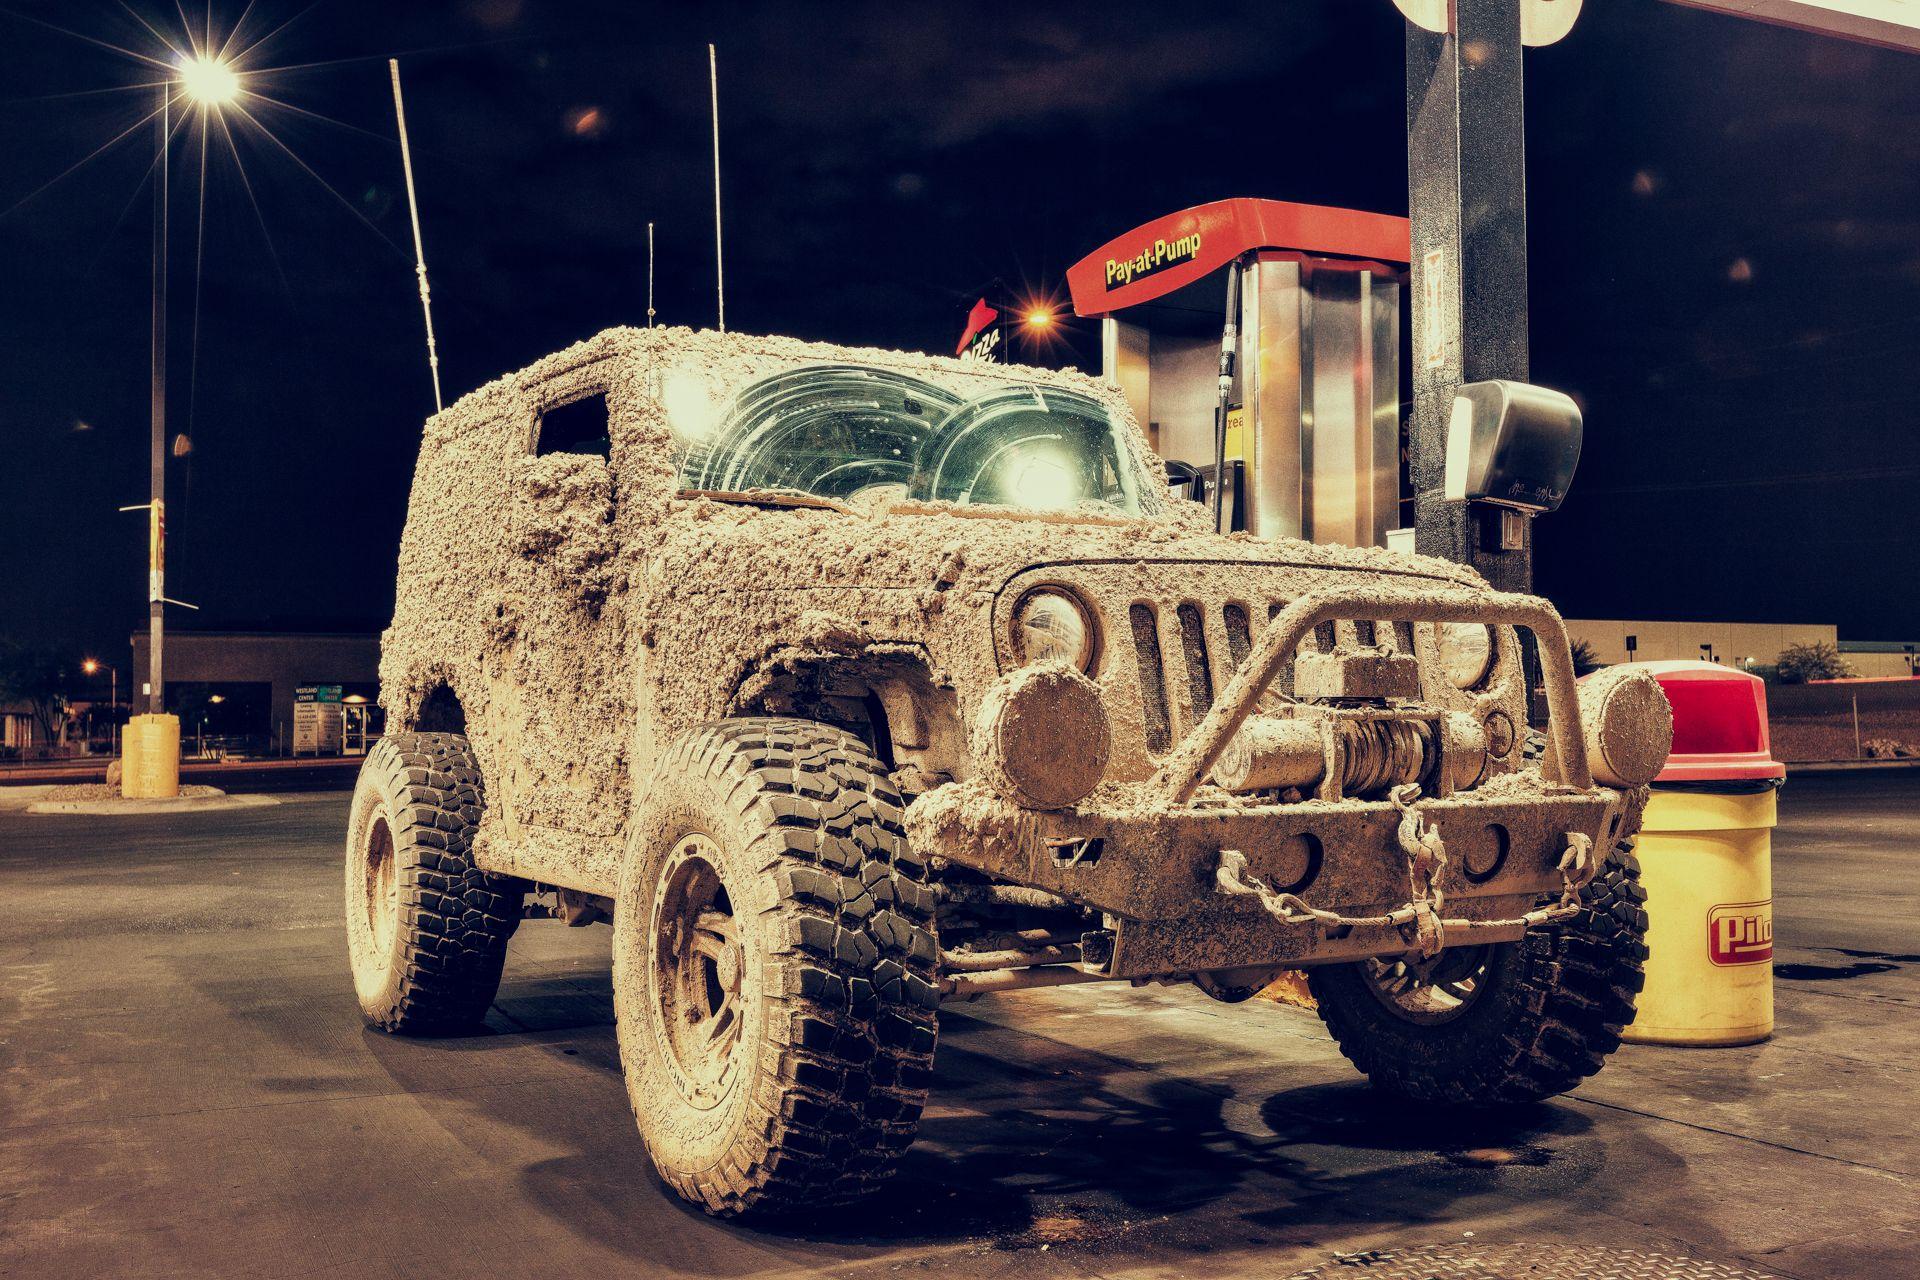 Mud Jeep Jeep 2010 Jeep Wrangler Mud Trucks